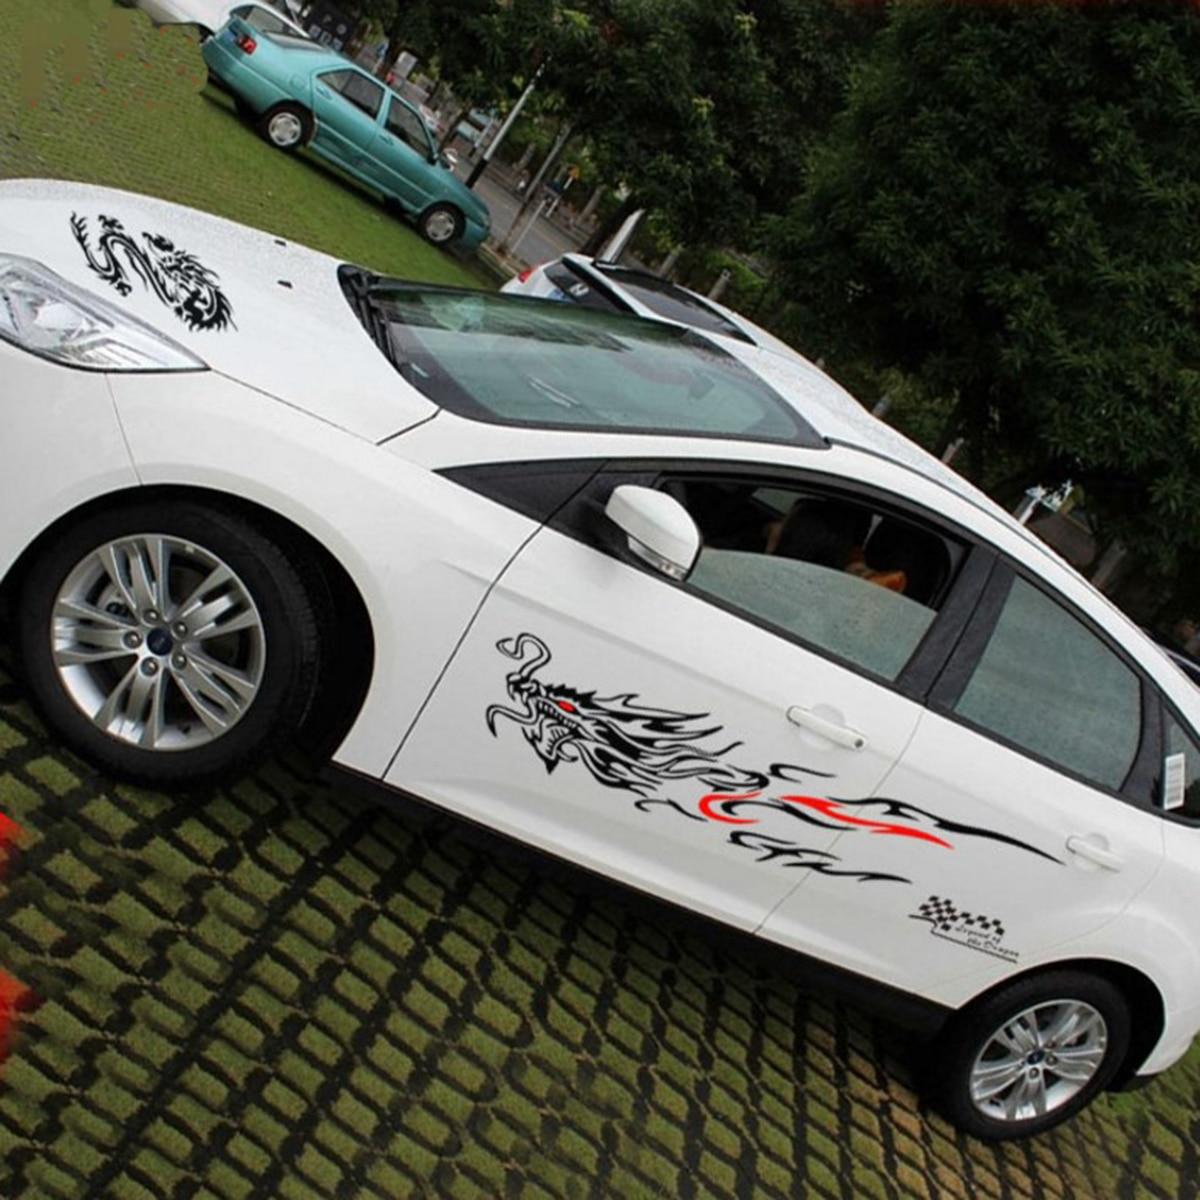 Car full body sticker design - Chinese Totem Dragon Graphics Side Decal Body Hood Car Stickers For Chevrolet Hyundai Vw Subaru Volvo